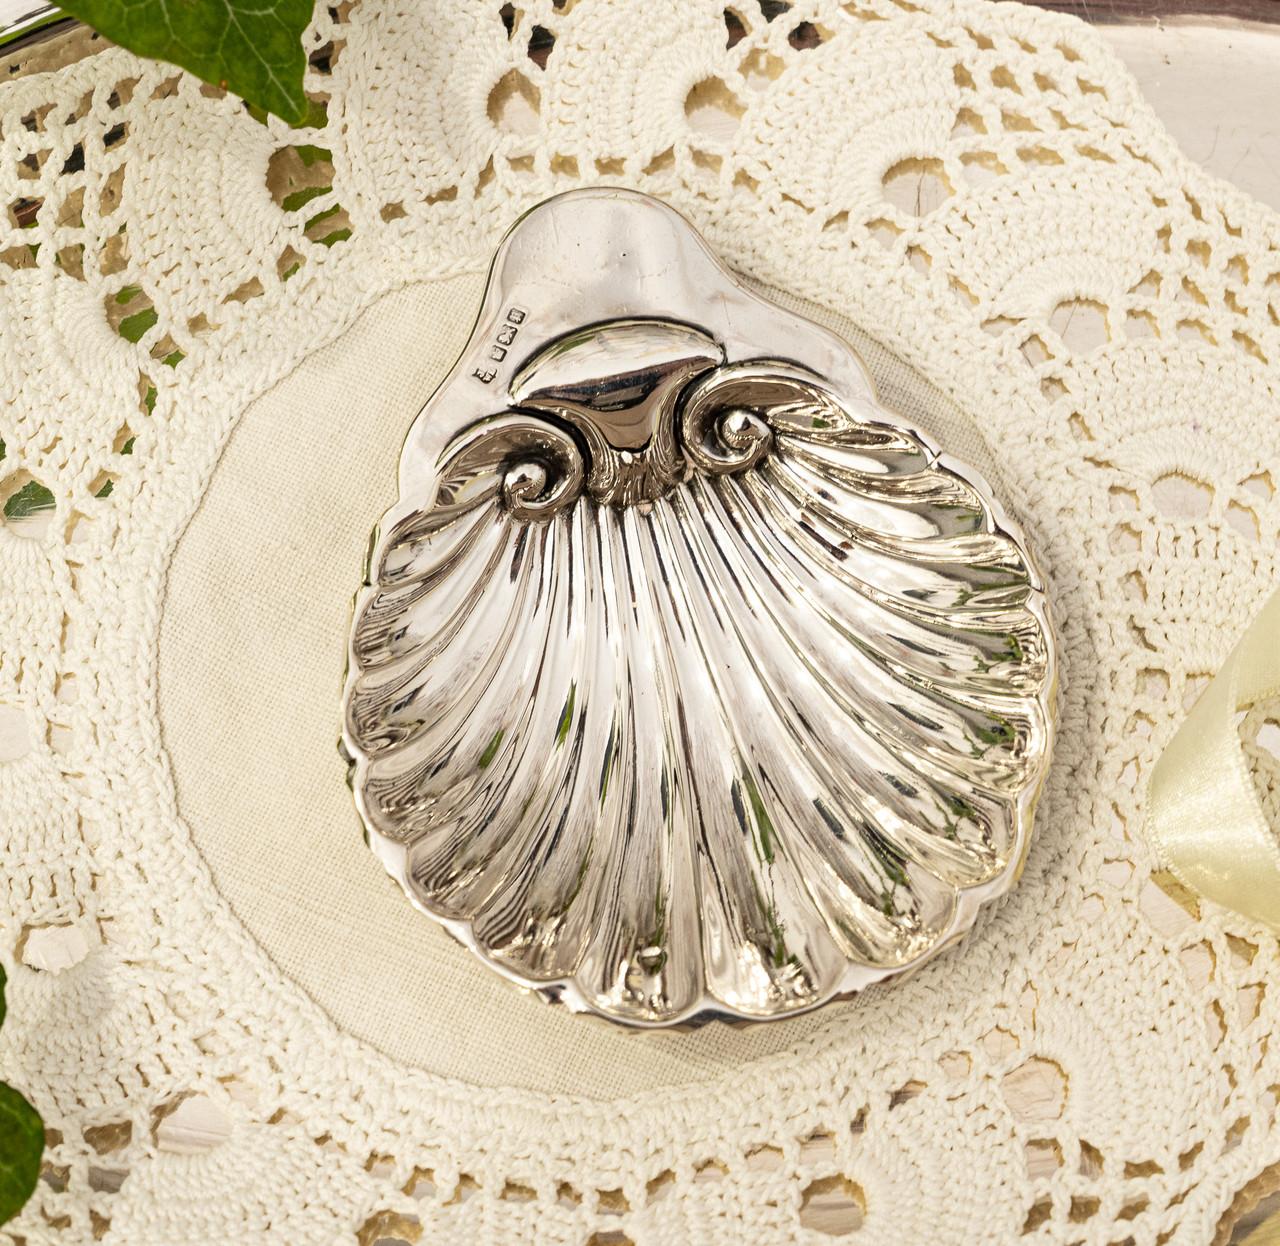 Серебряная икорница, ракушка, серебро 925 пробы, столовое серебро, James Deakin, 1909 год, Англия, Sheffield